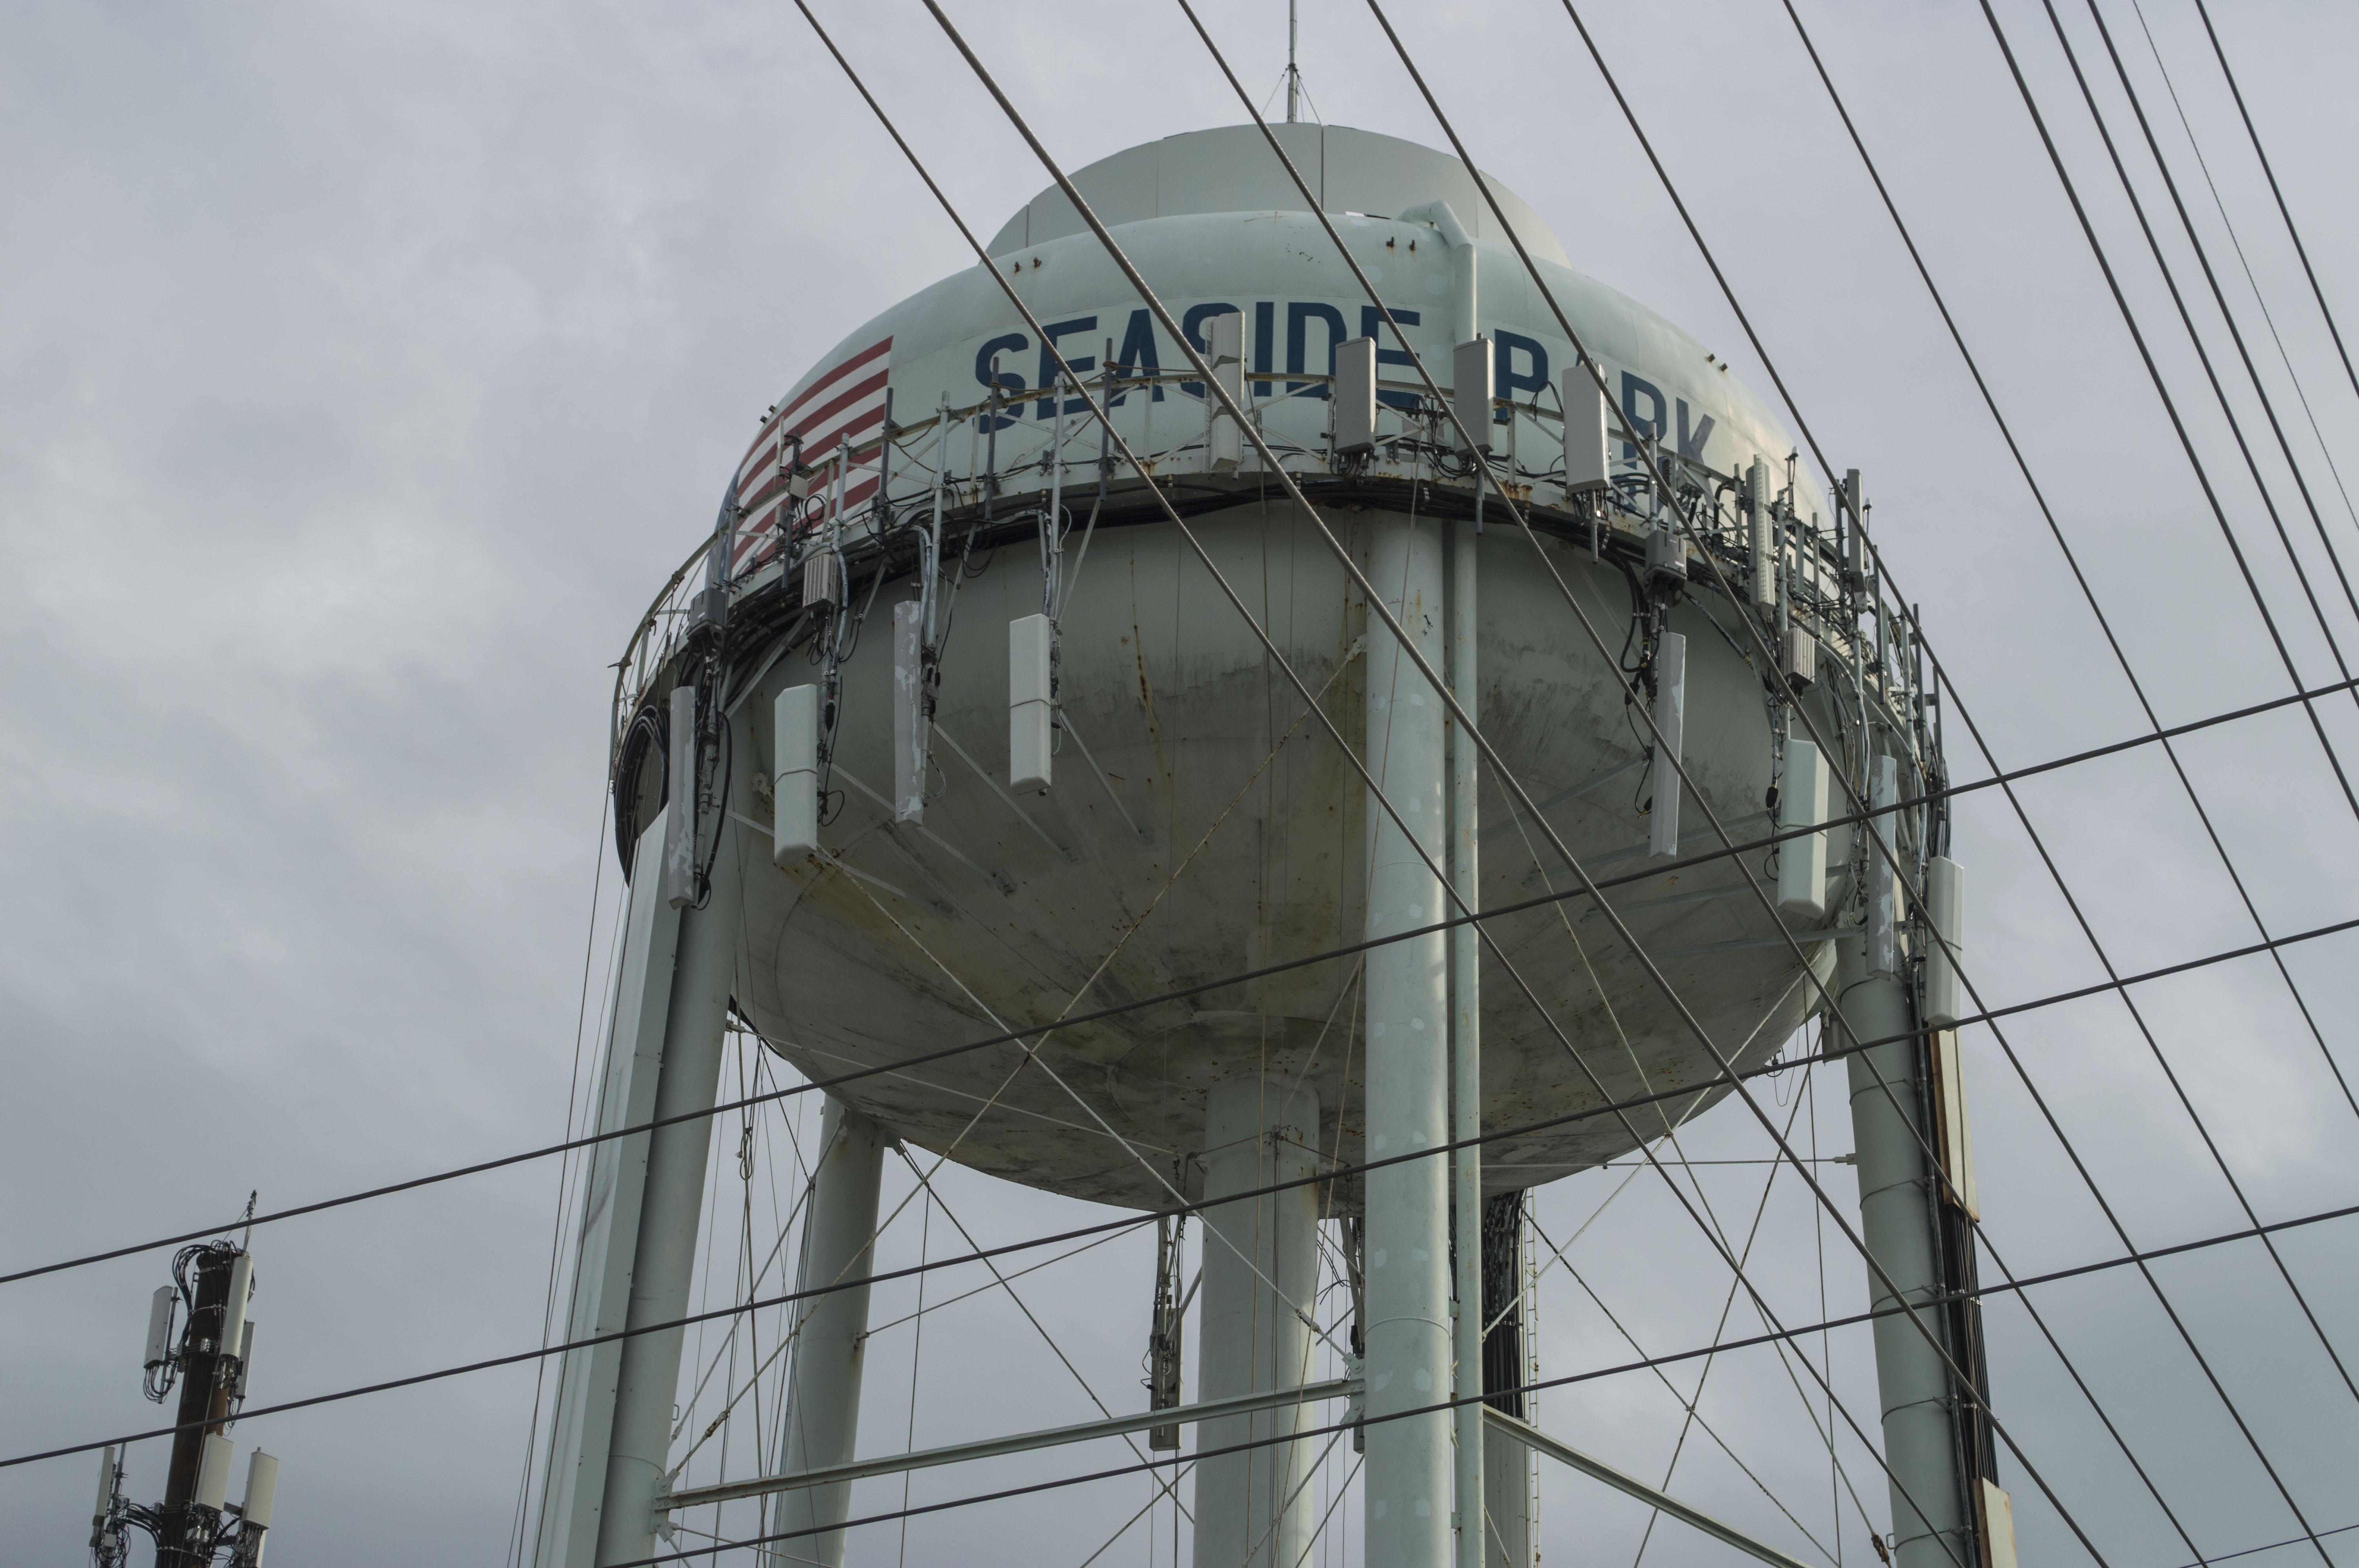 Seaside Park water tower. (Photo: Daniel Nee)